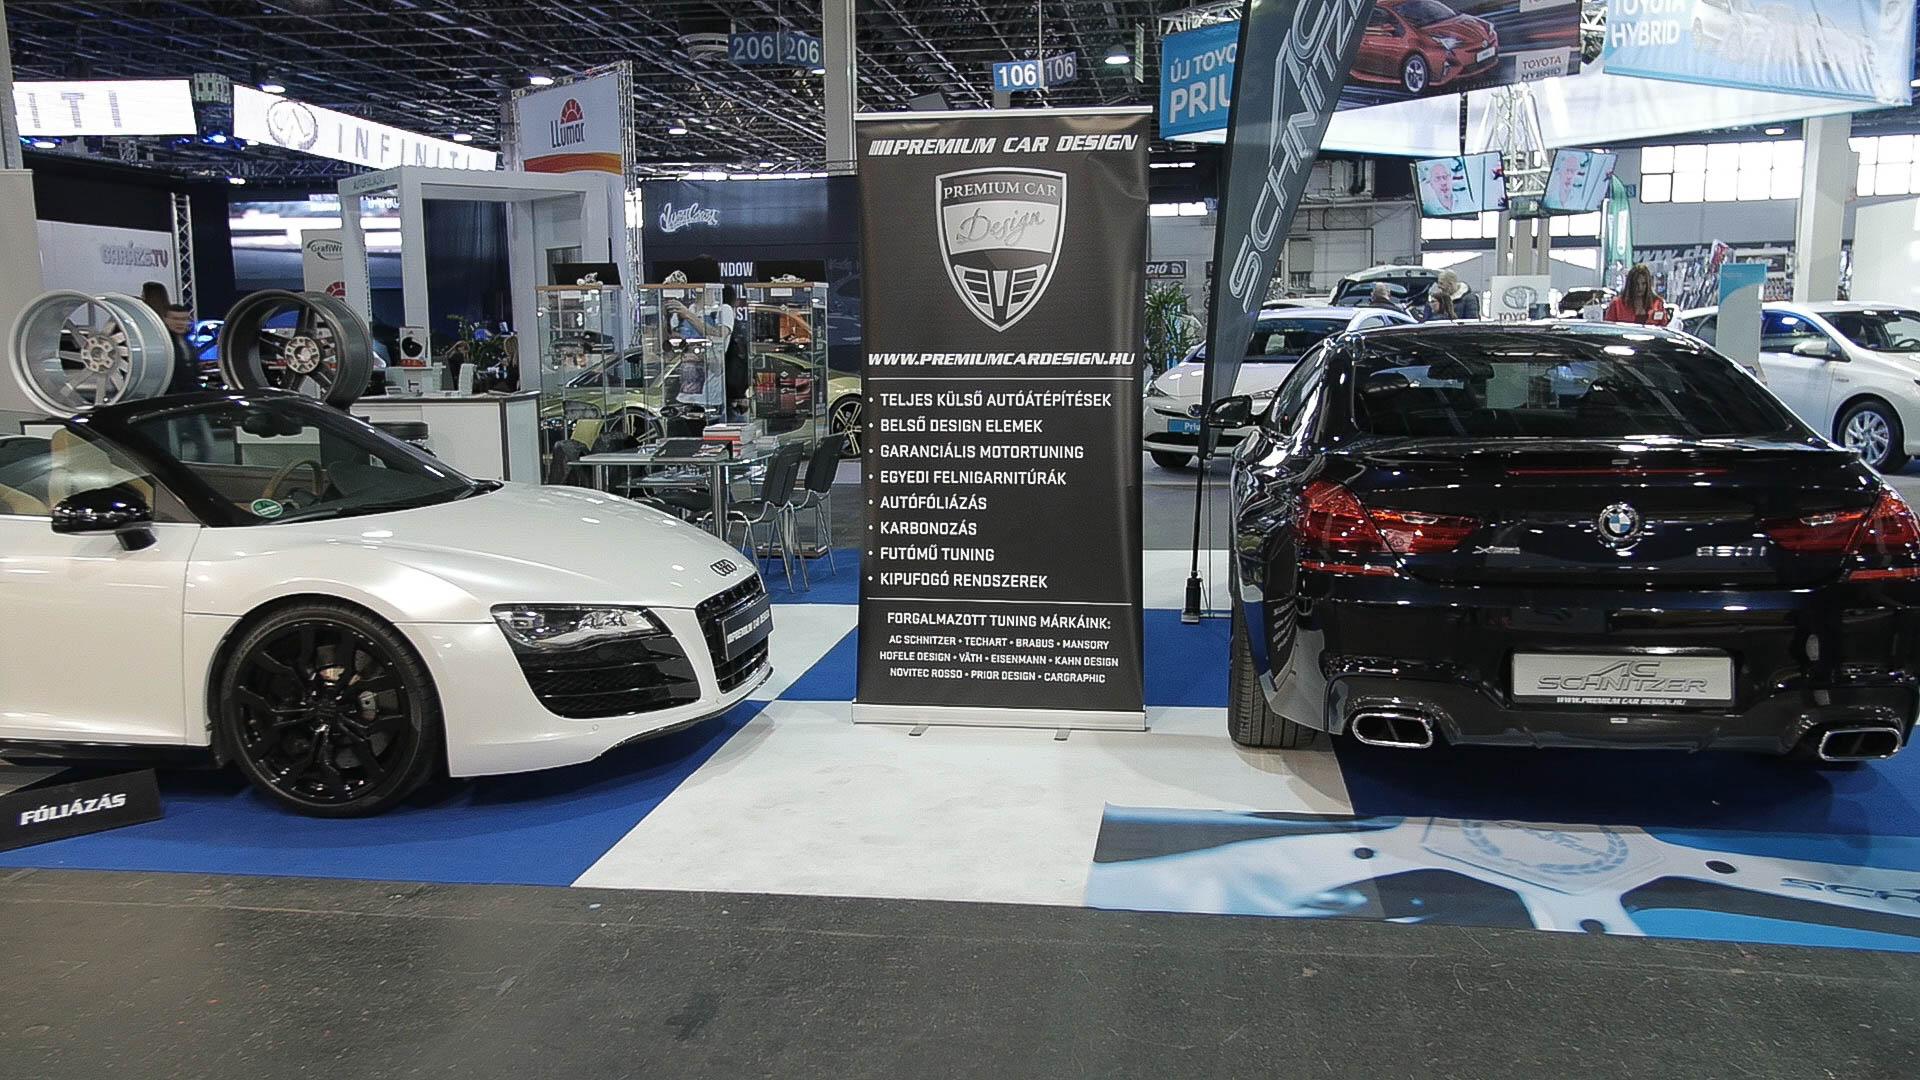 Premium Car Design bemutató videó - AMTS 2016